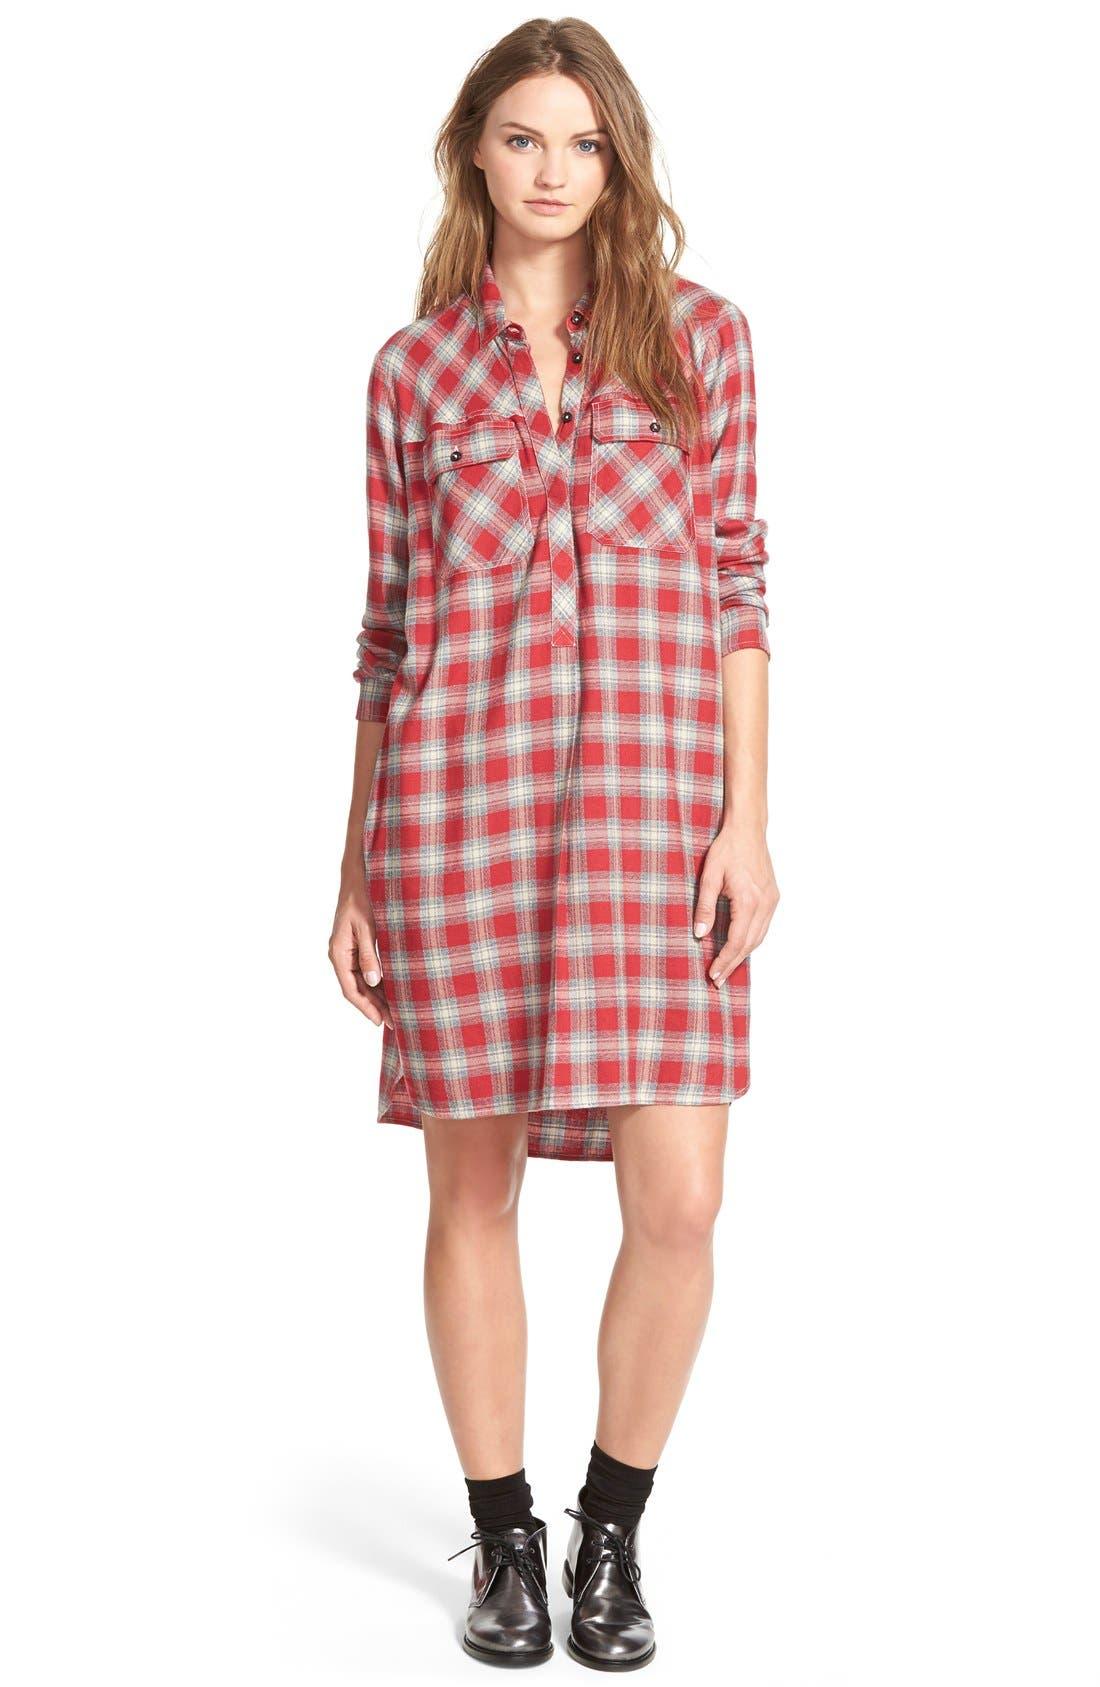 Main Image - MadewellPlaid Shirtdress